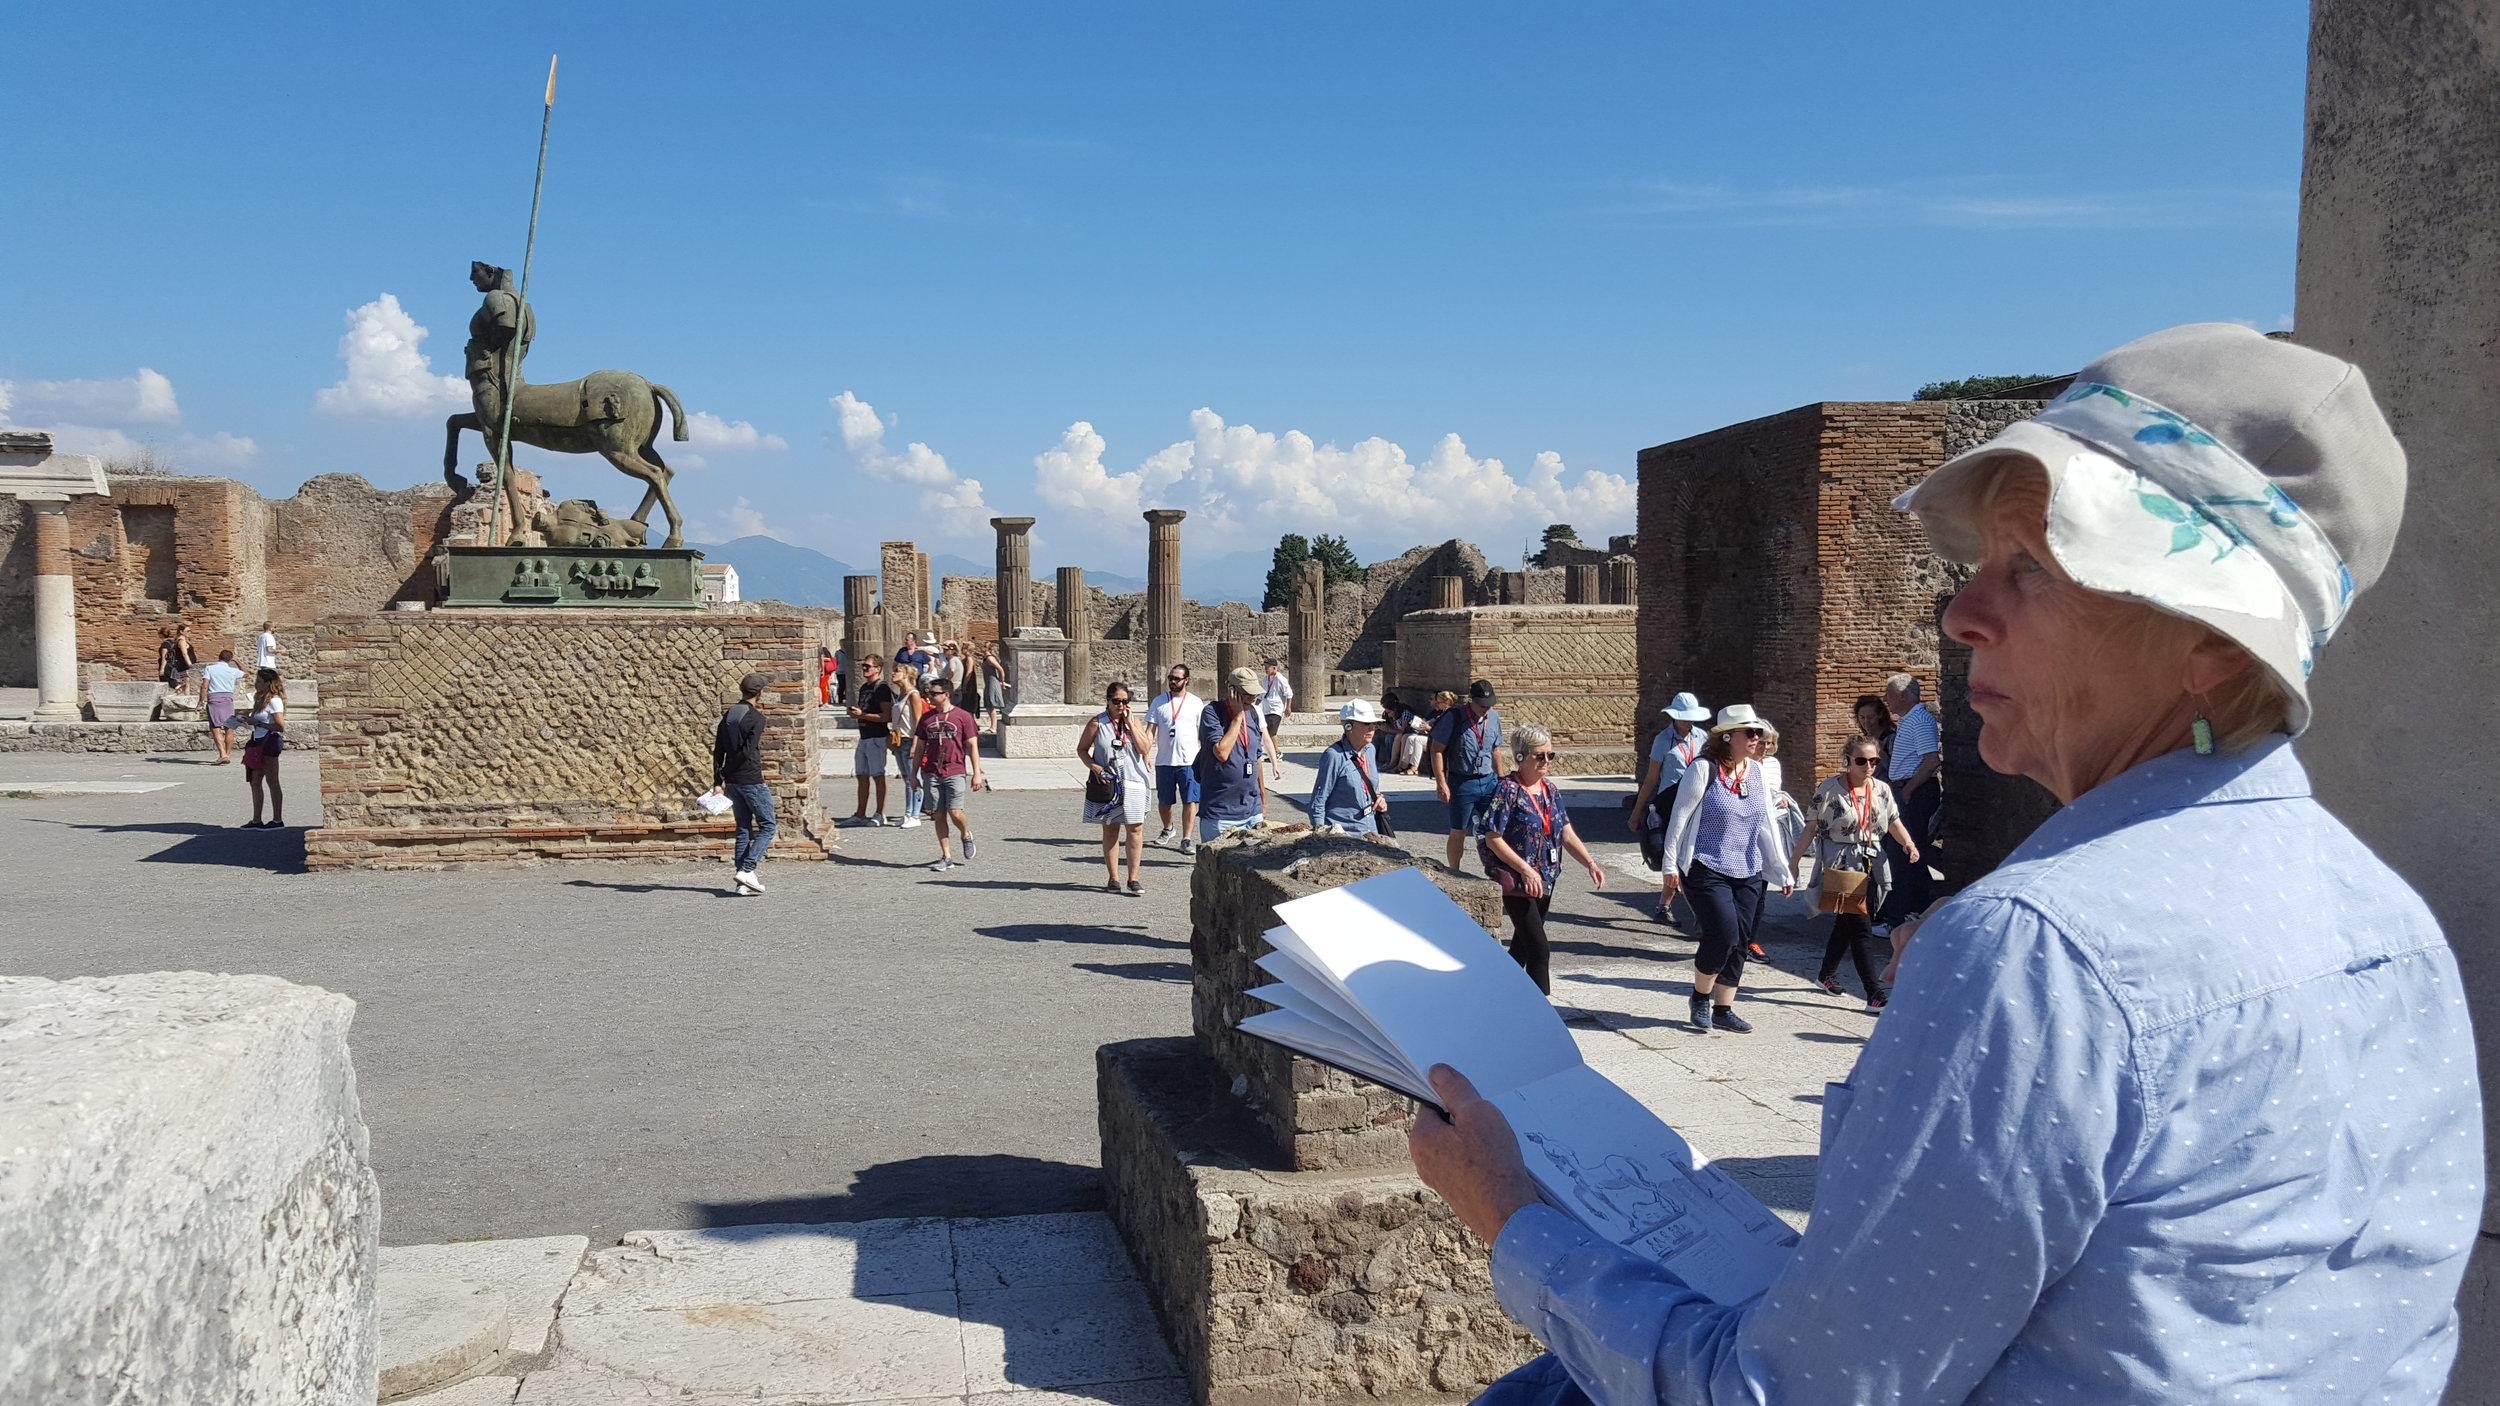 Amalfi-Pompeii art holiday